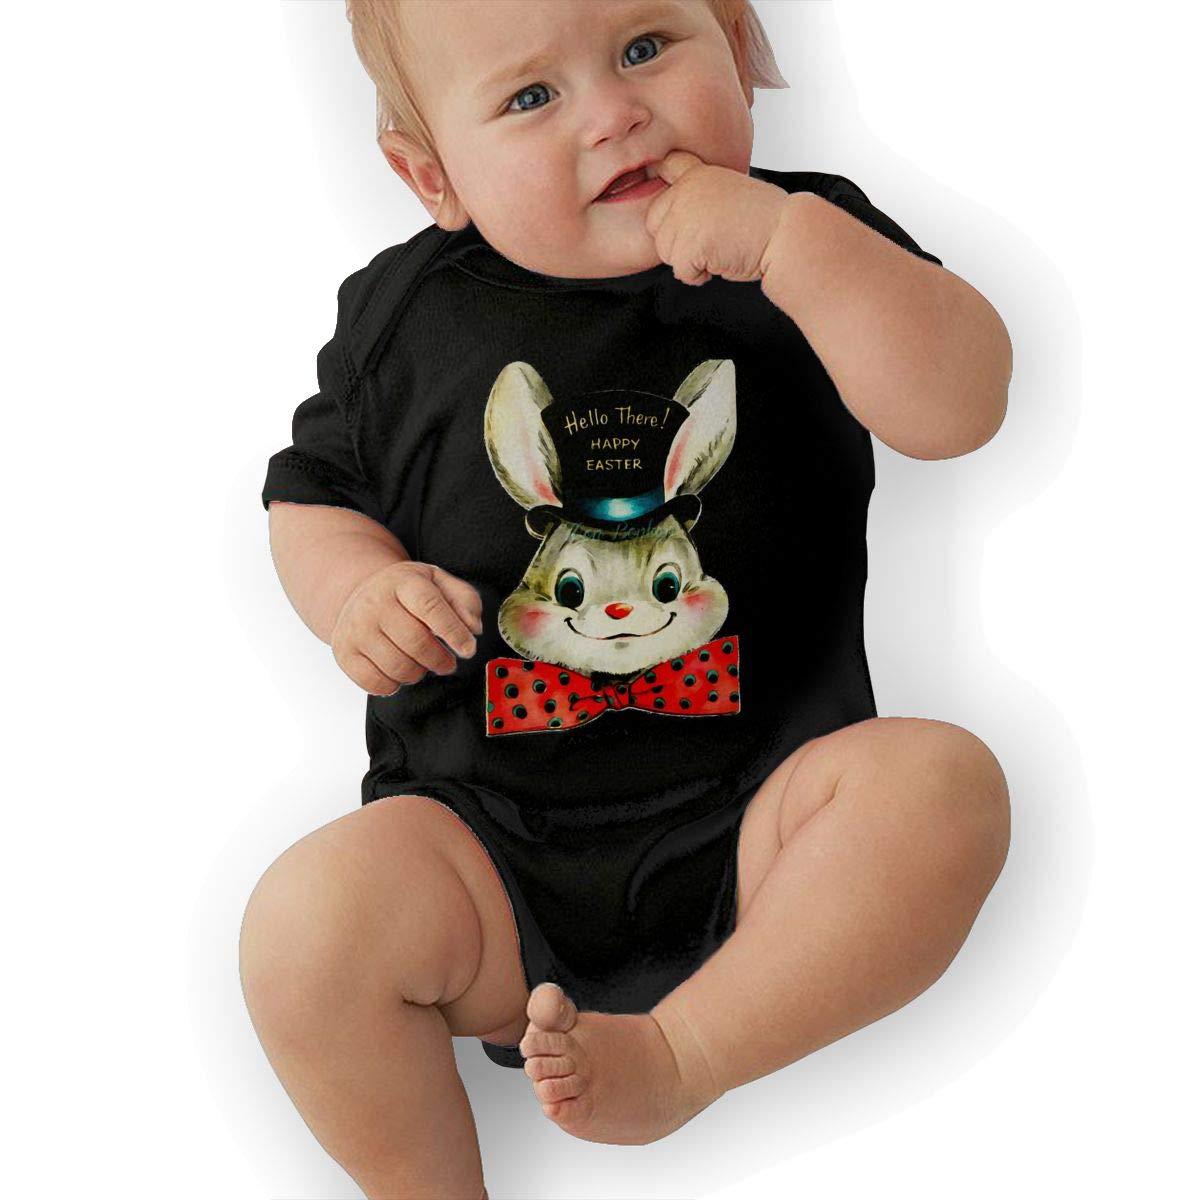 A14UBP Infant Baby Boys Girls Long Sleeve Romper Bodysuit LYFE SHRKS Unisex Button Playsuit Outfit Clothes